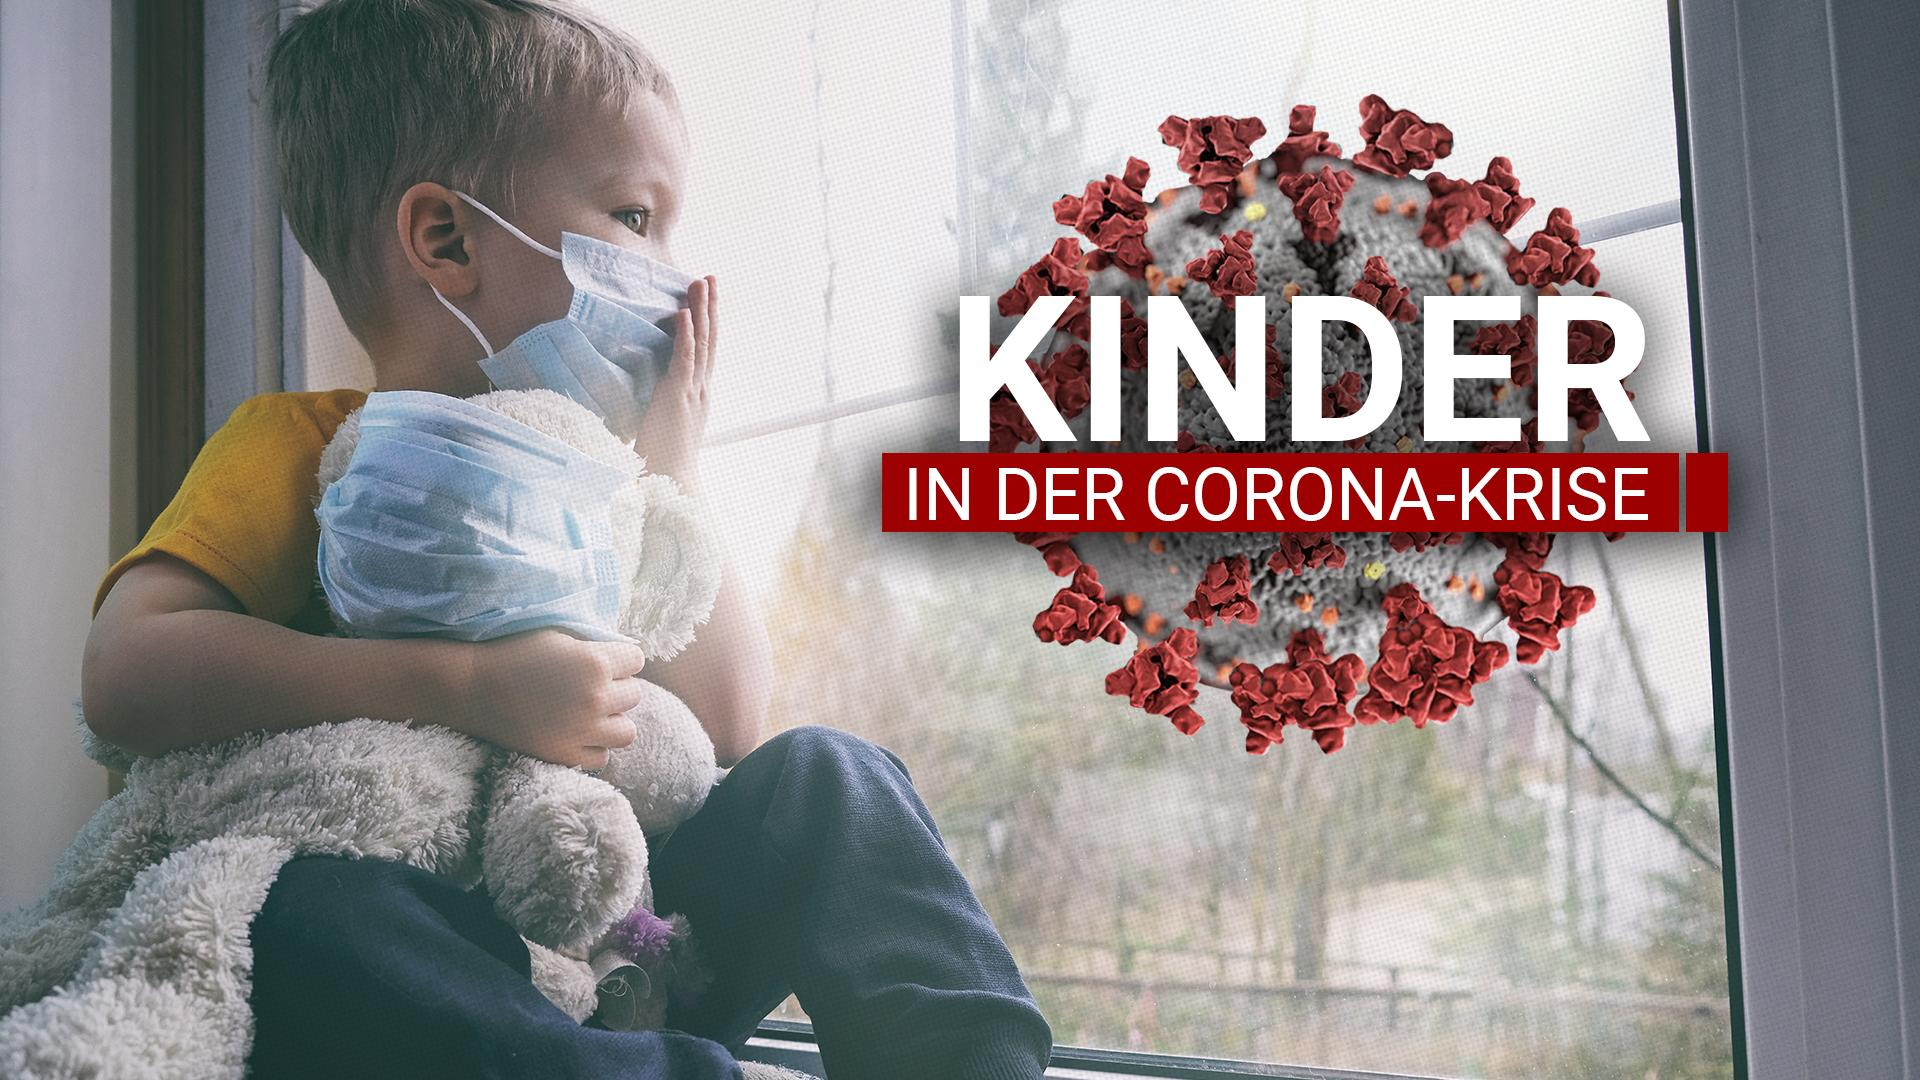 Kinder in der Corona-Krise